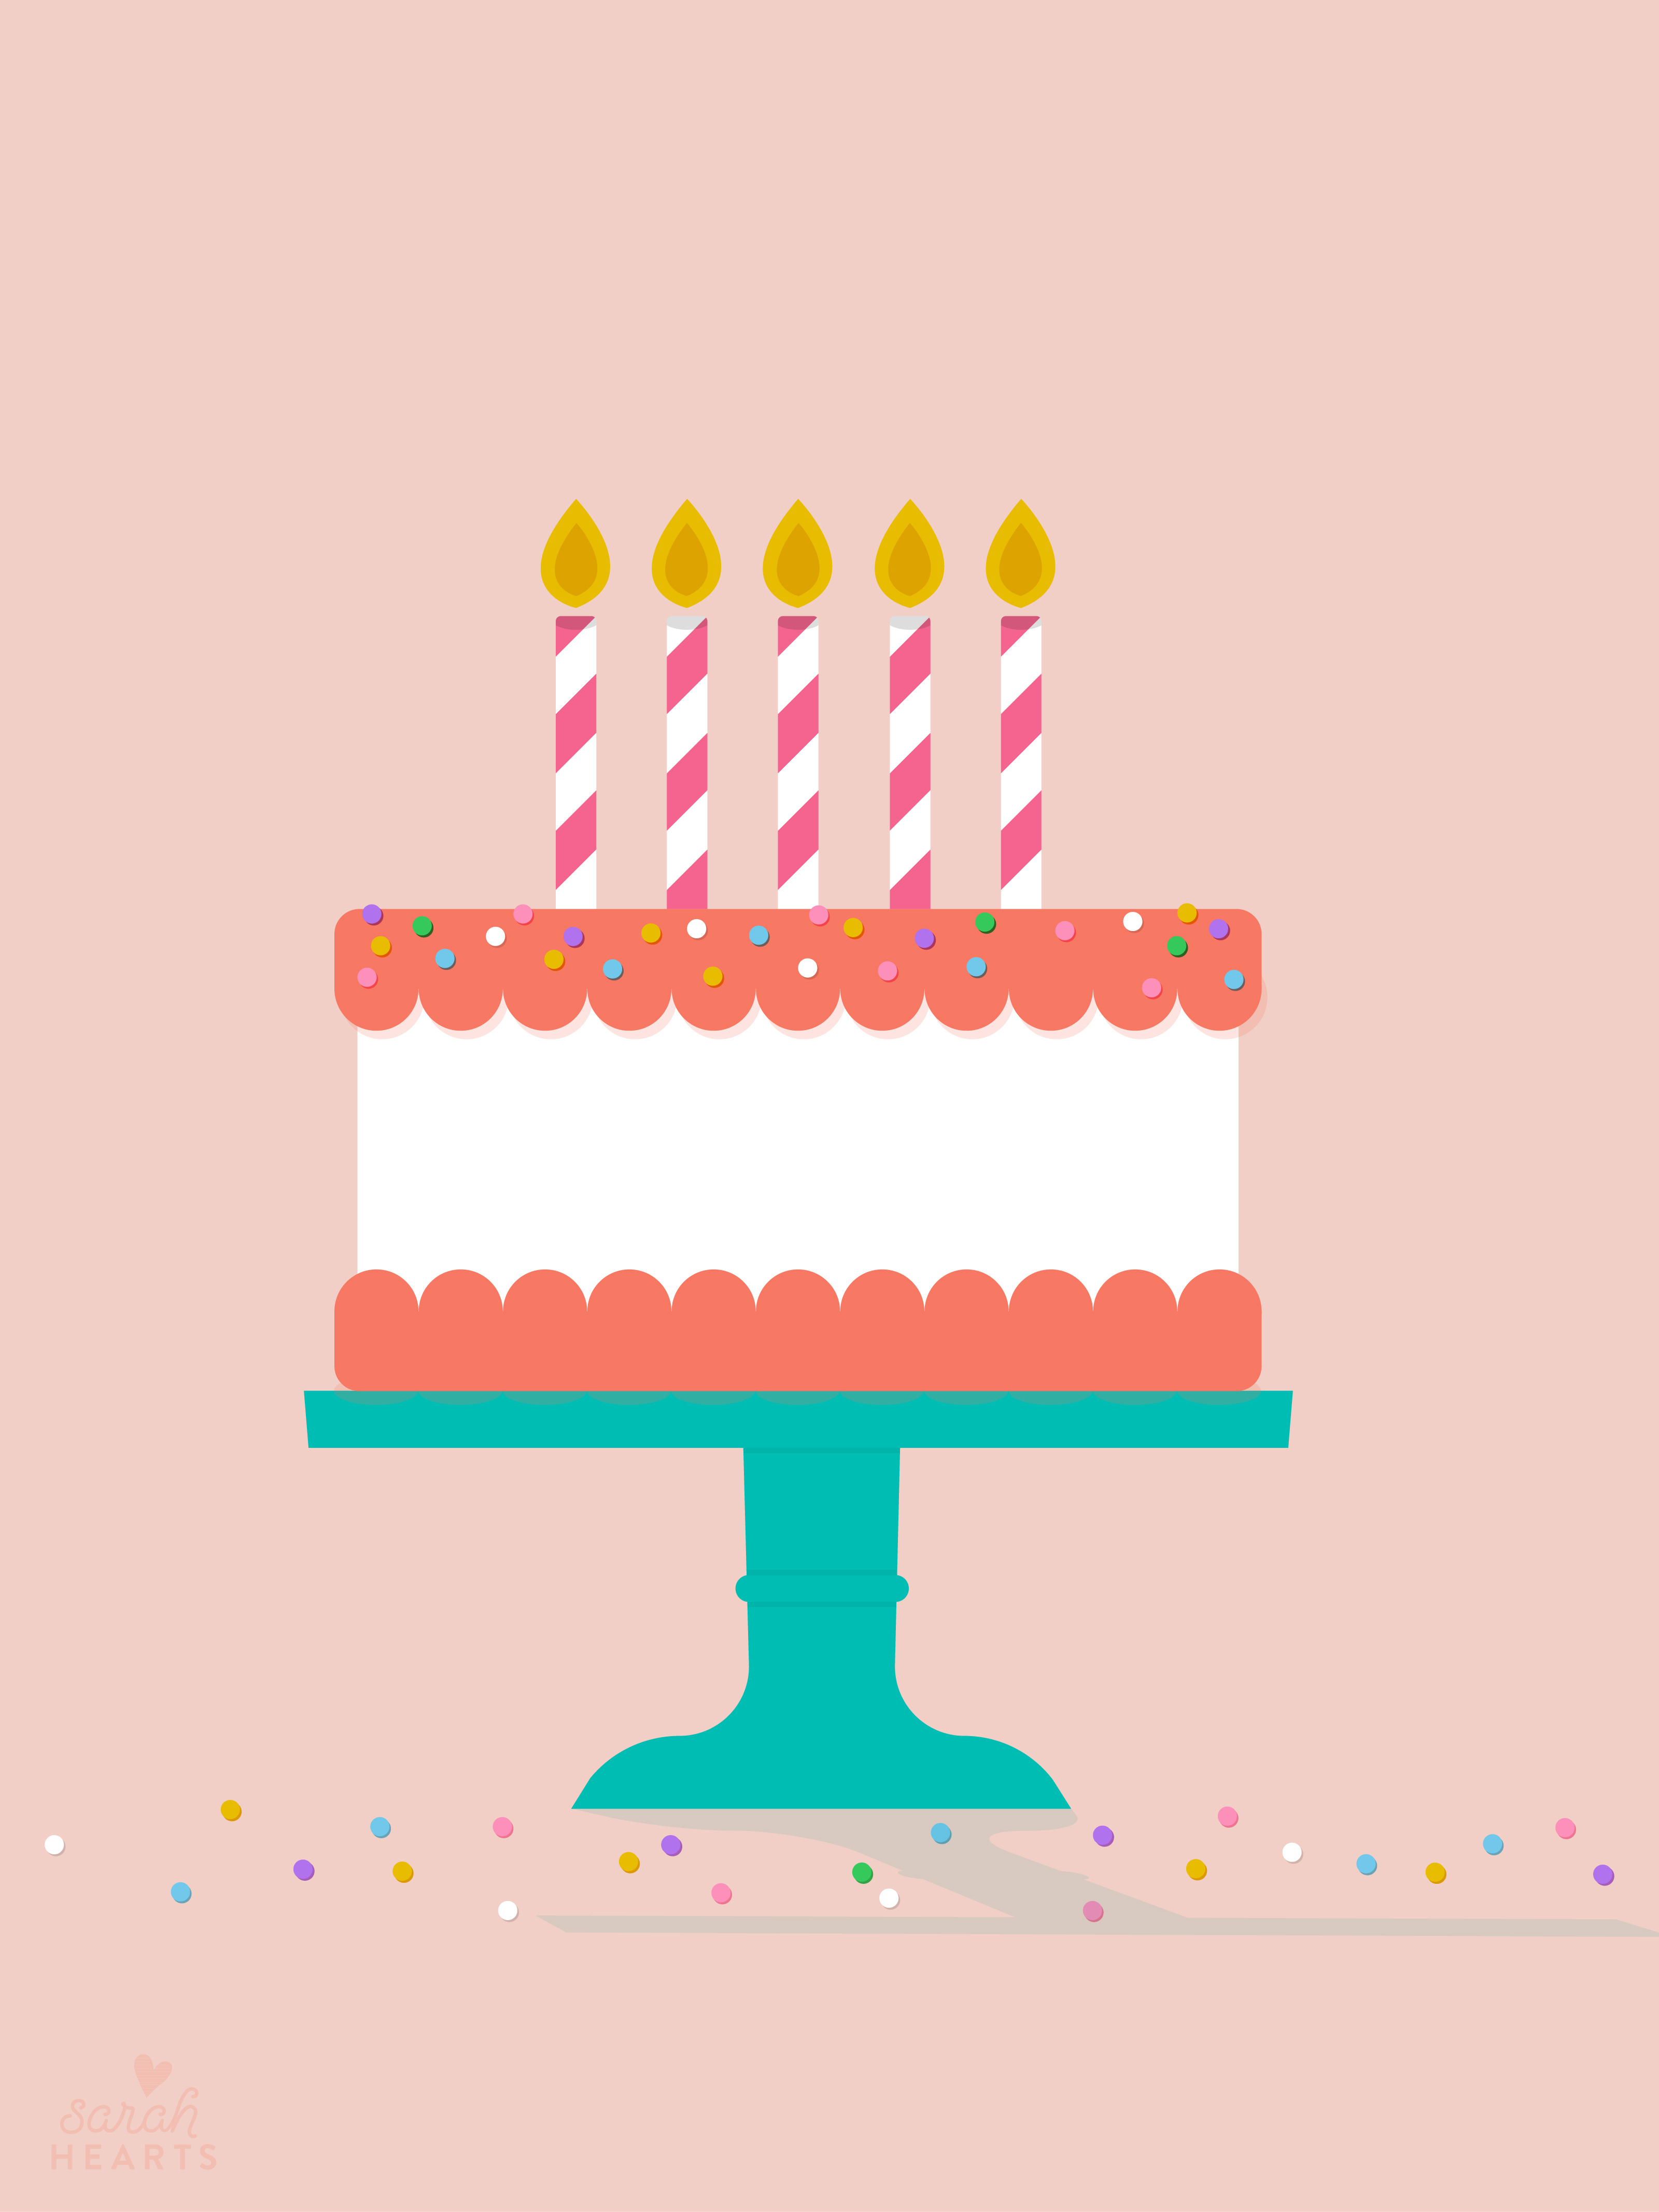 Cute Home Screen Wallpaper For Iphone July 2016 Birthday Cake Calendar Wallpaper Sarah Hearts